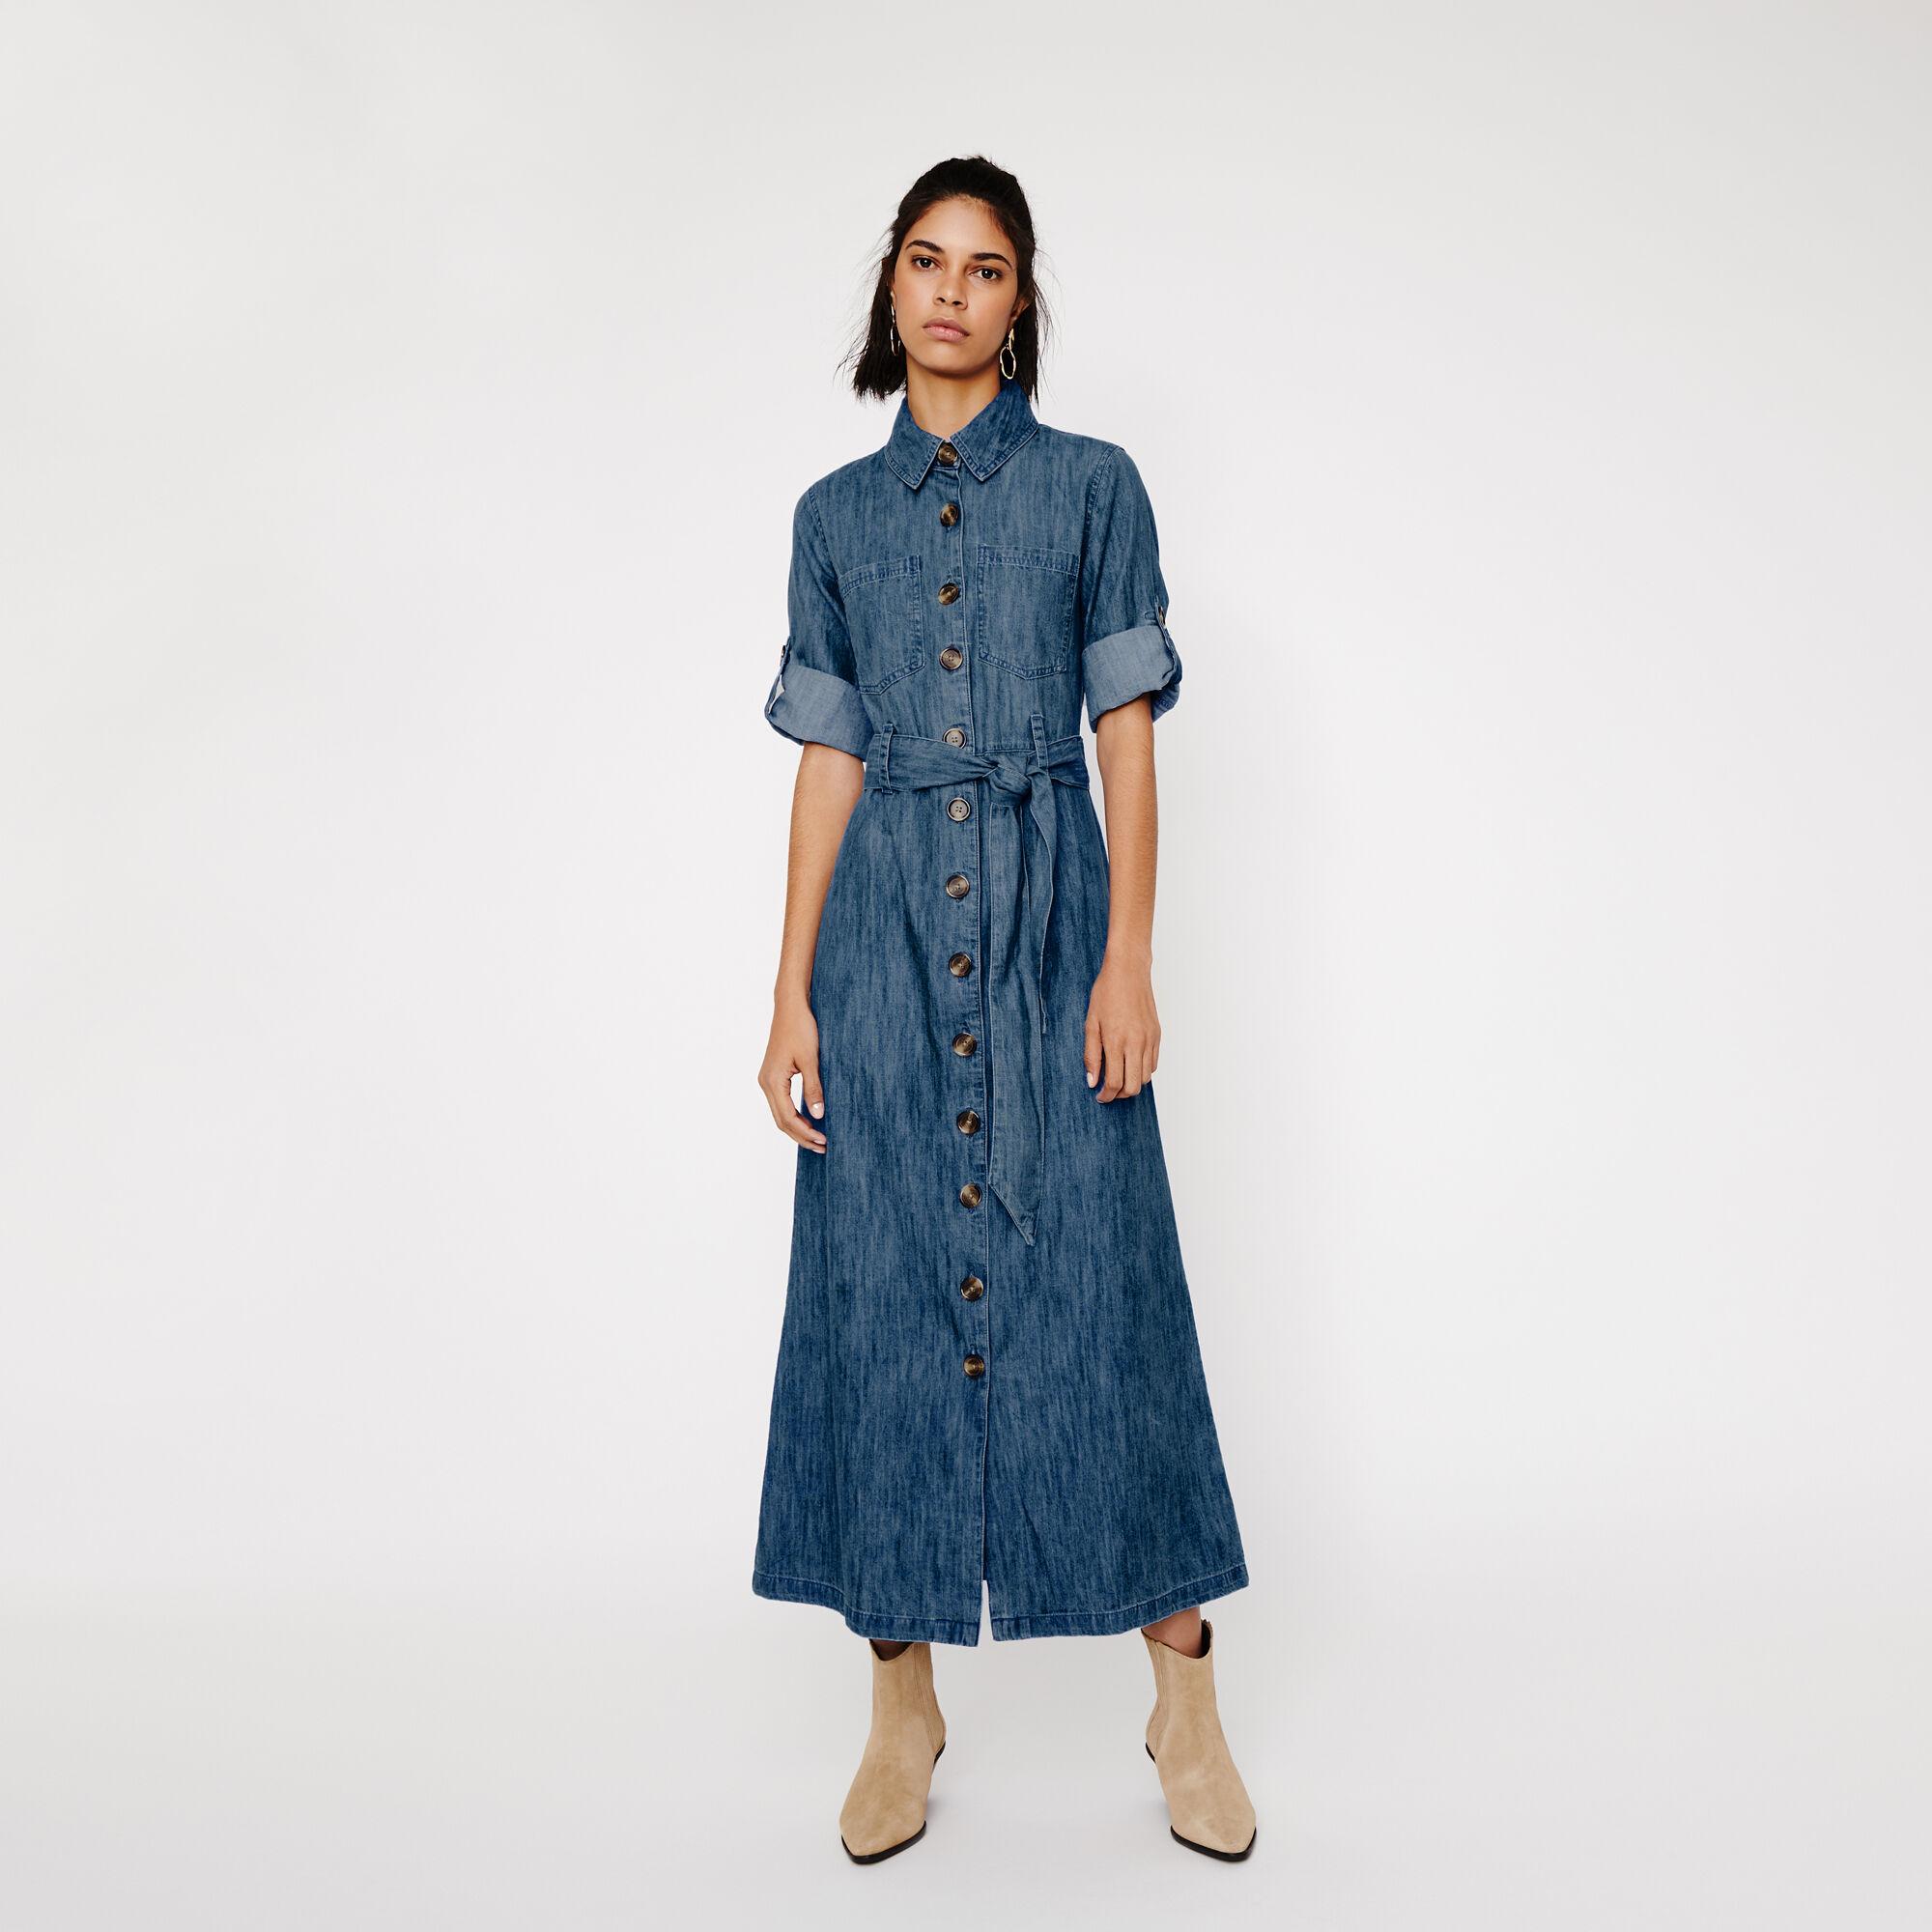 Warehouse, DENIM MAXI SHIRT DRESS Light Wash Denim 1